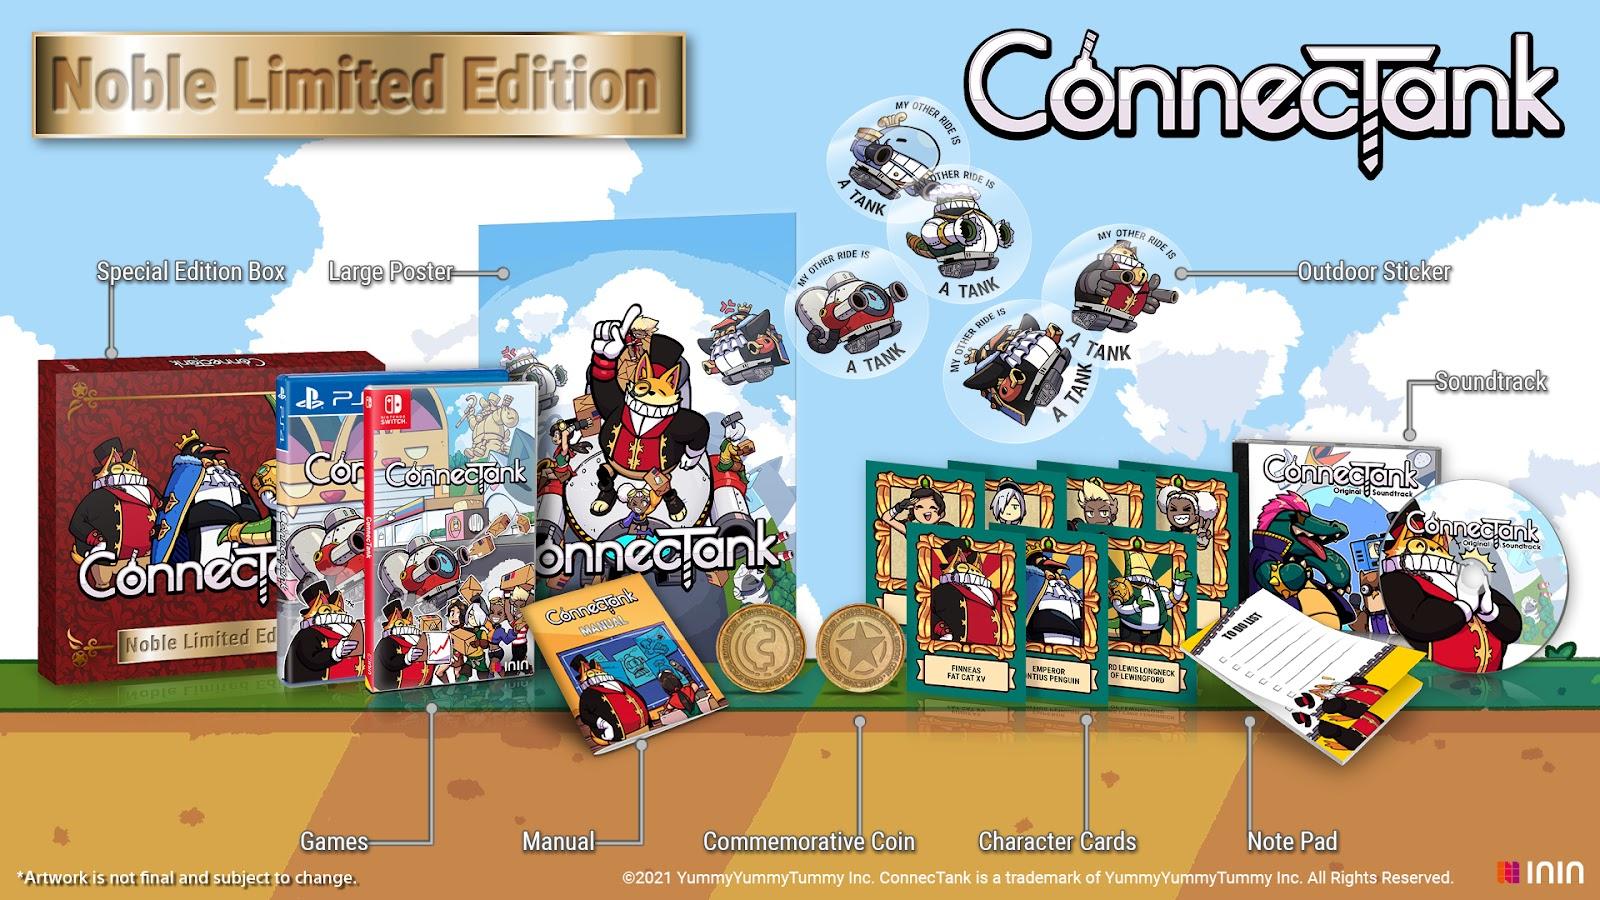 Noble Limited Edition Packshot